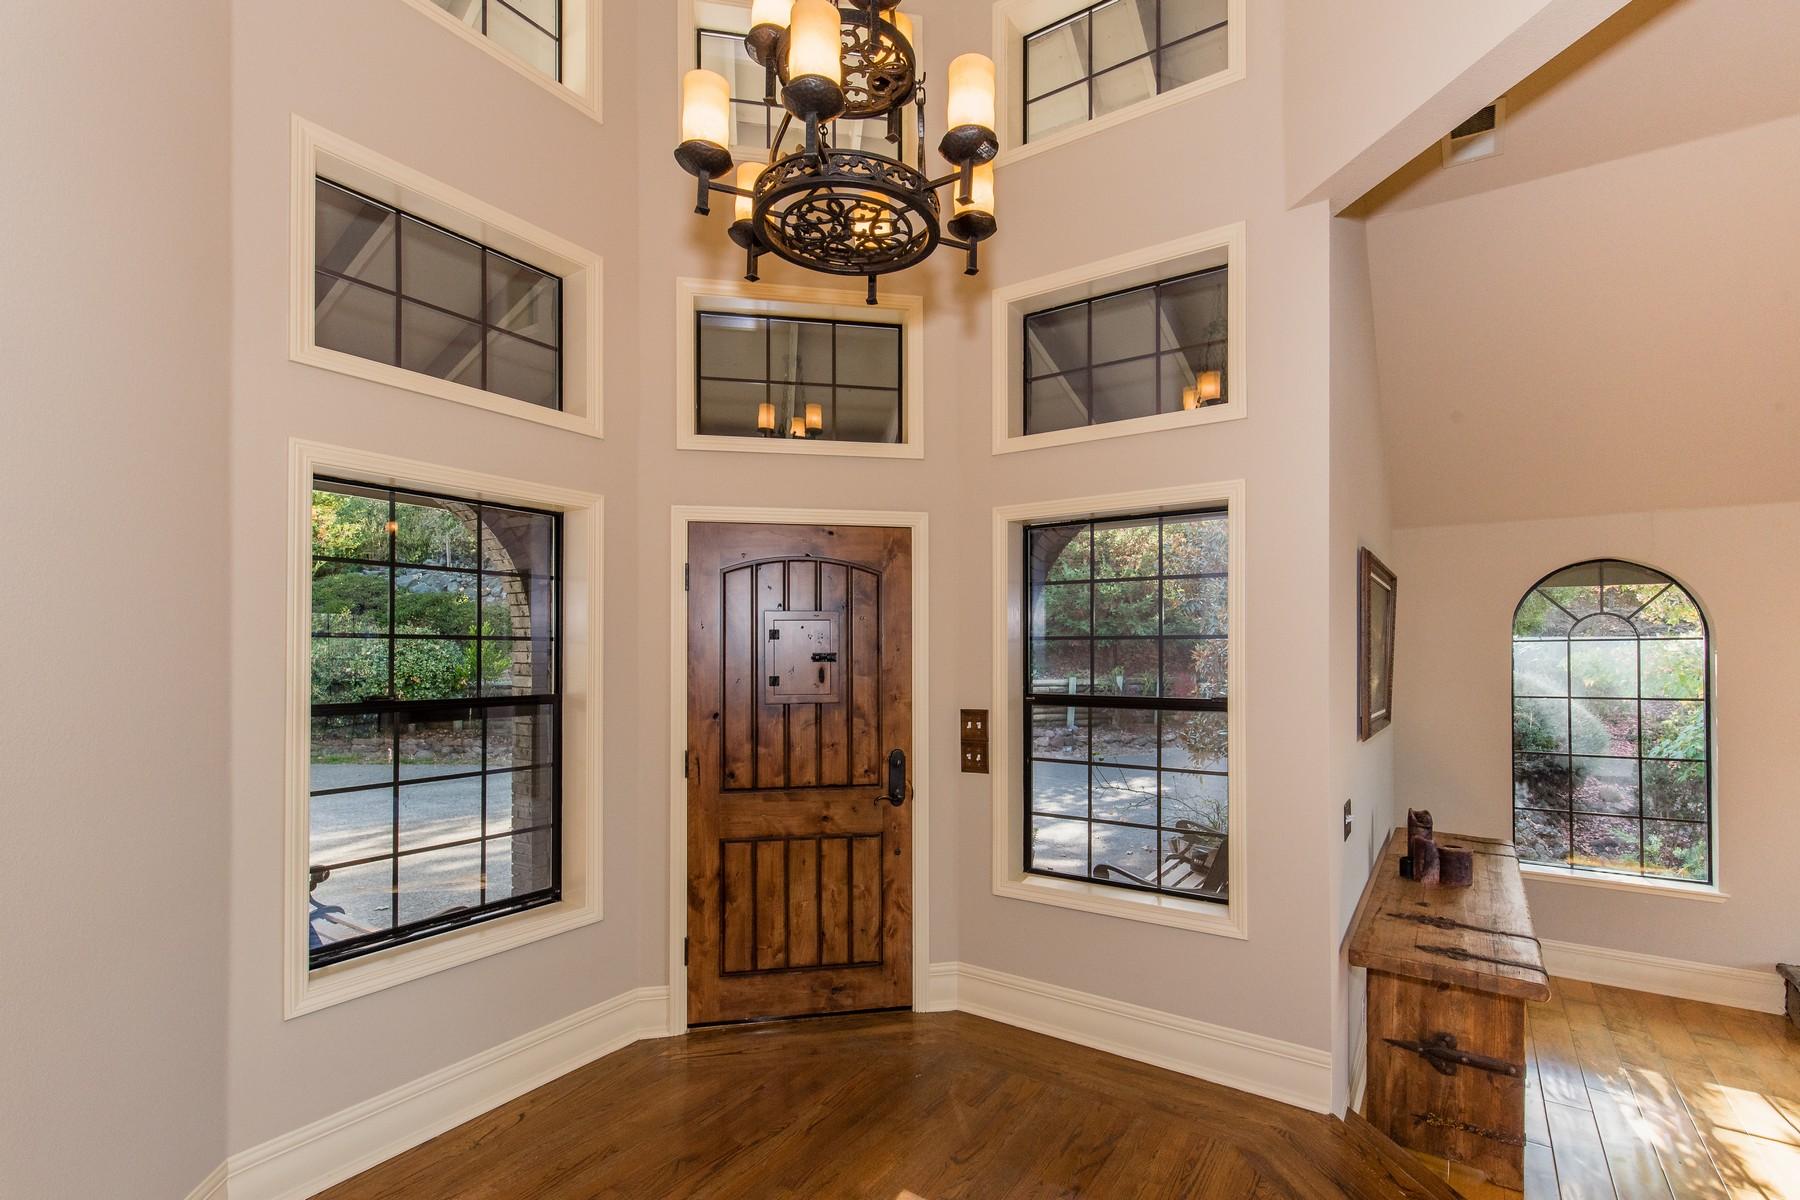 Additional photo for property listing at 1755 Crystal Springs Court  Santa Rosa, California 95404 Estados Unidos